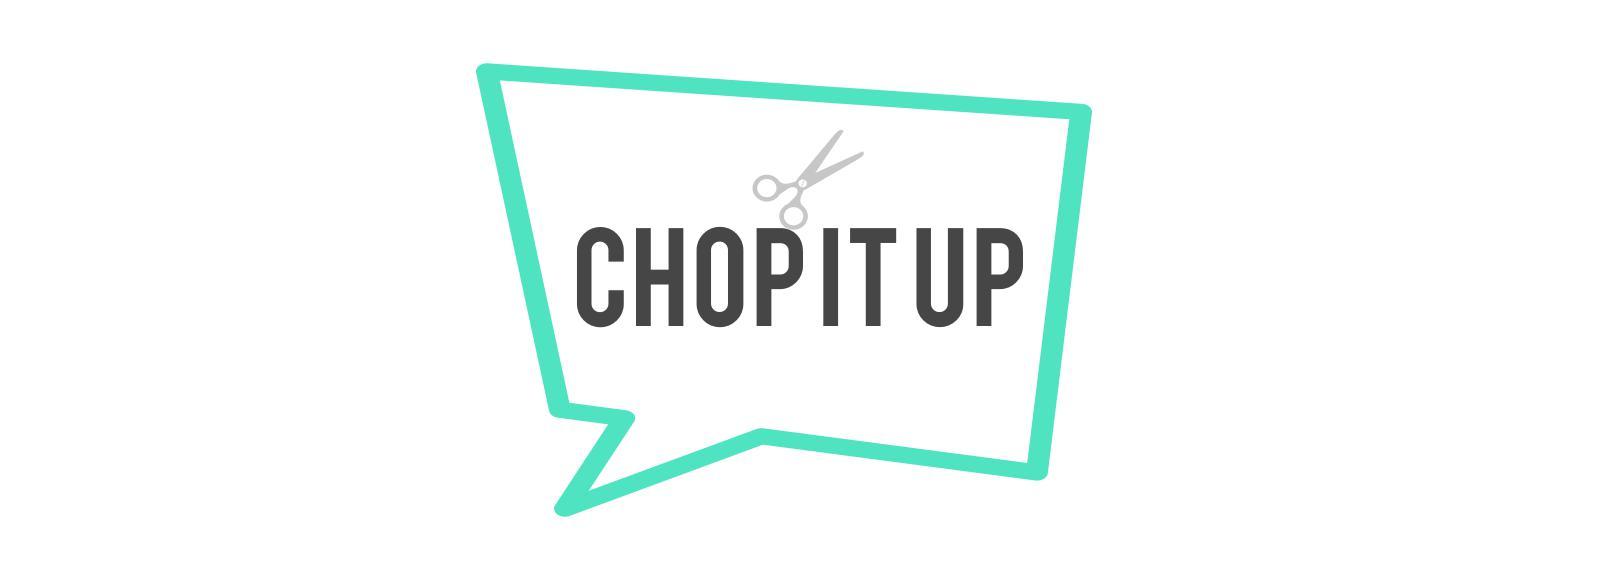 chop-it-up-logo_24691560_b9384be9073539bcb4820deb293227b908c59e8a.jpeg